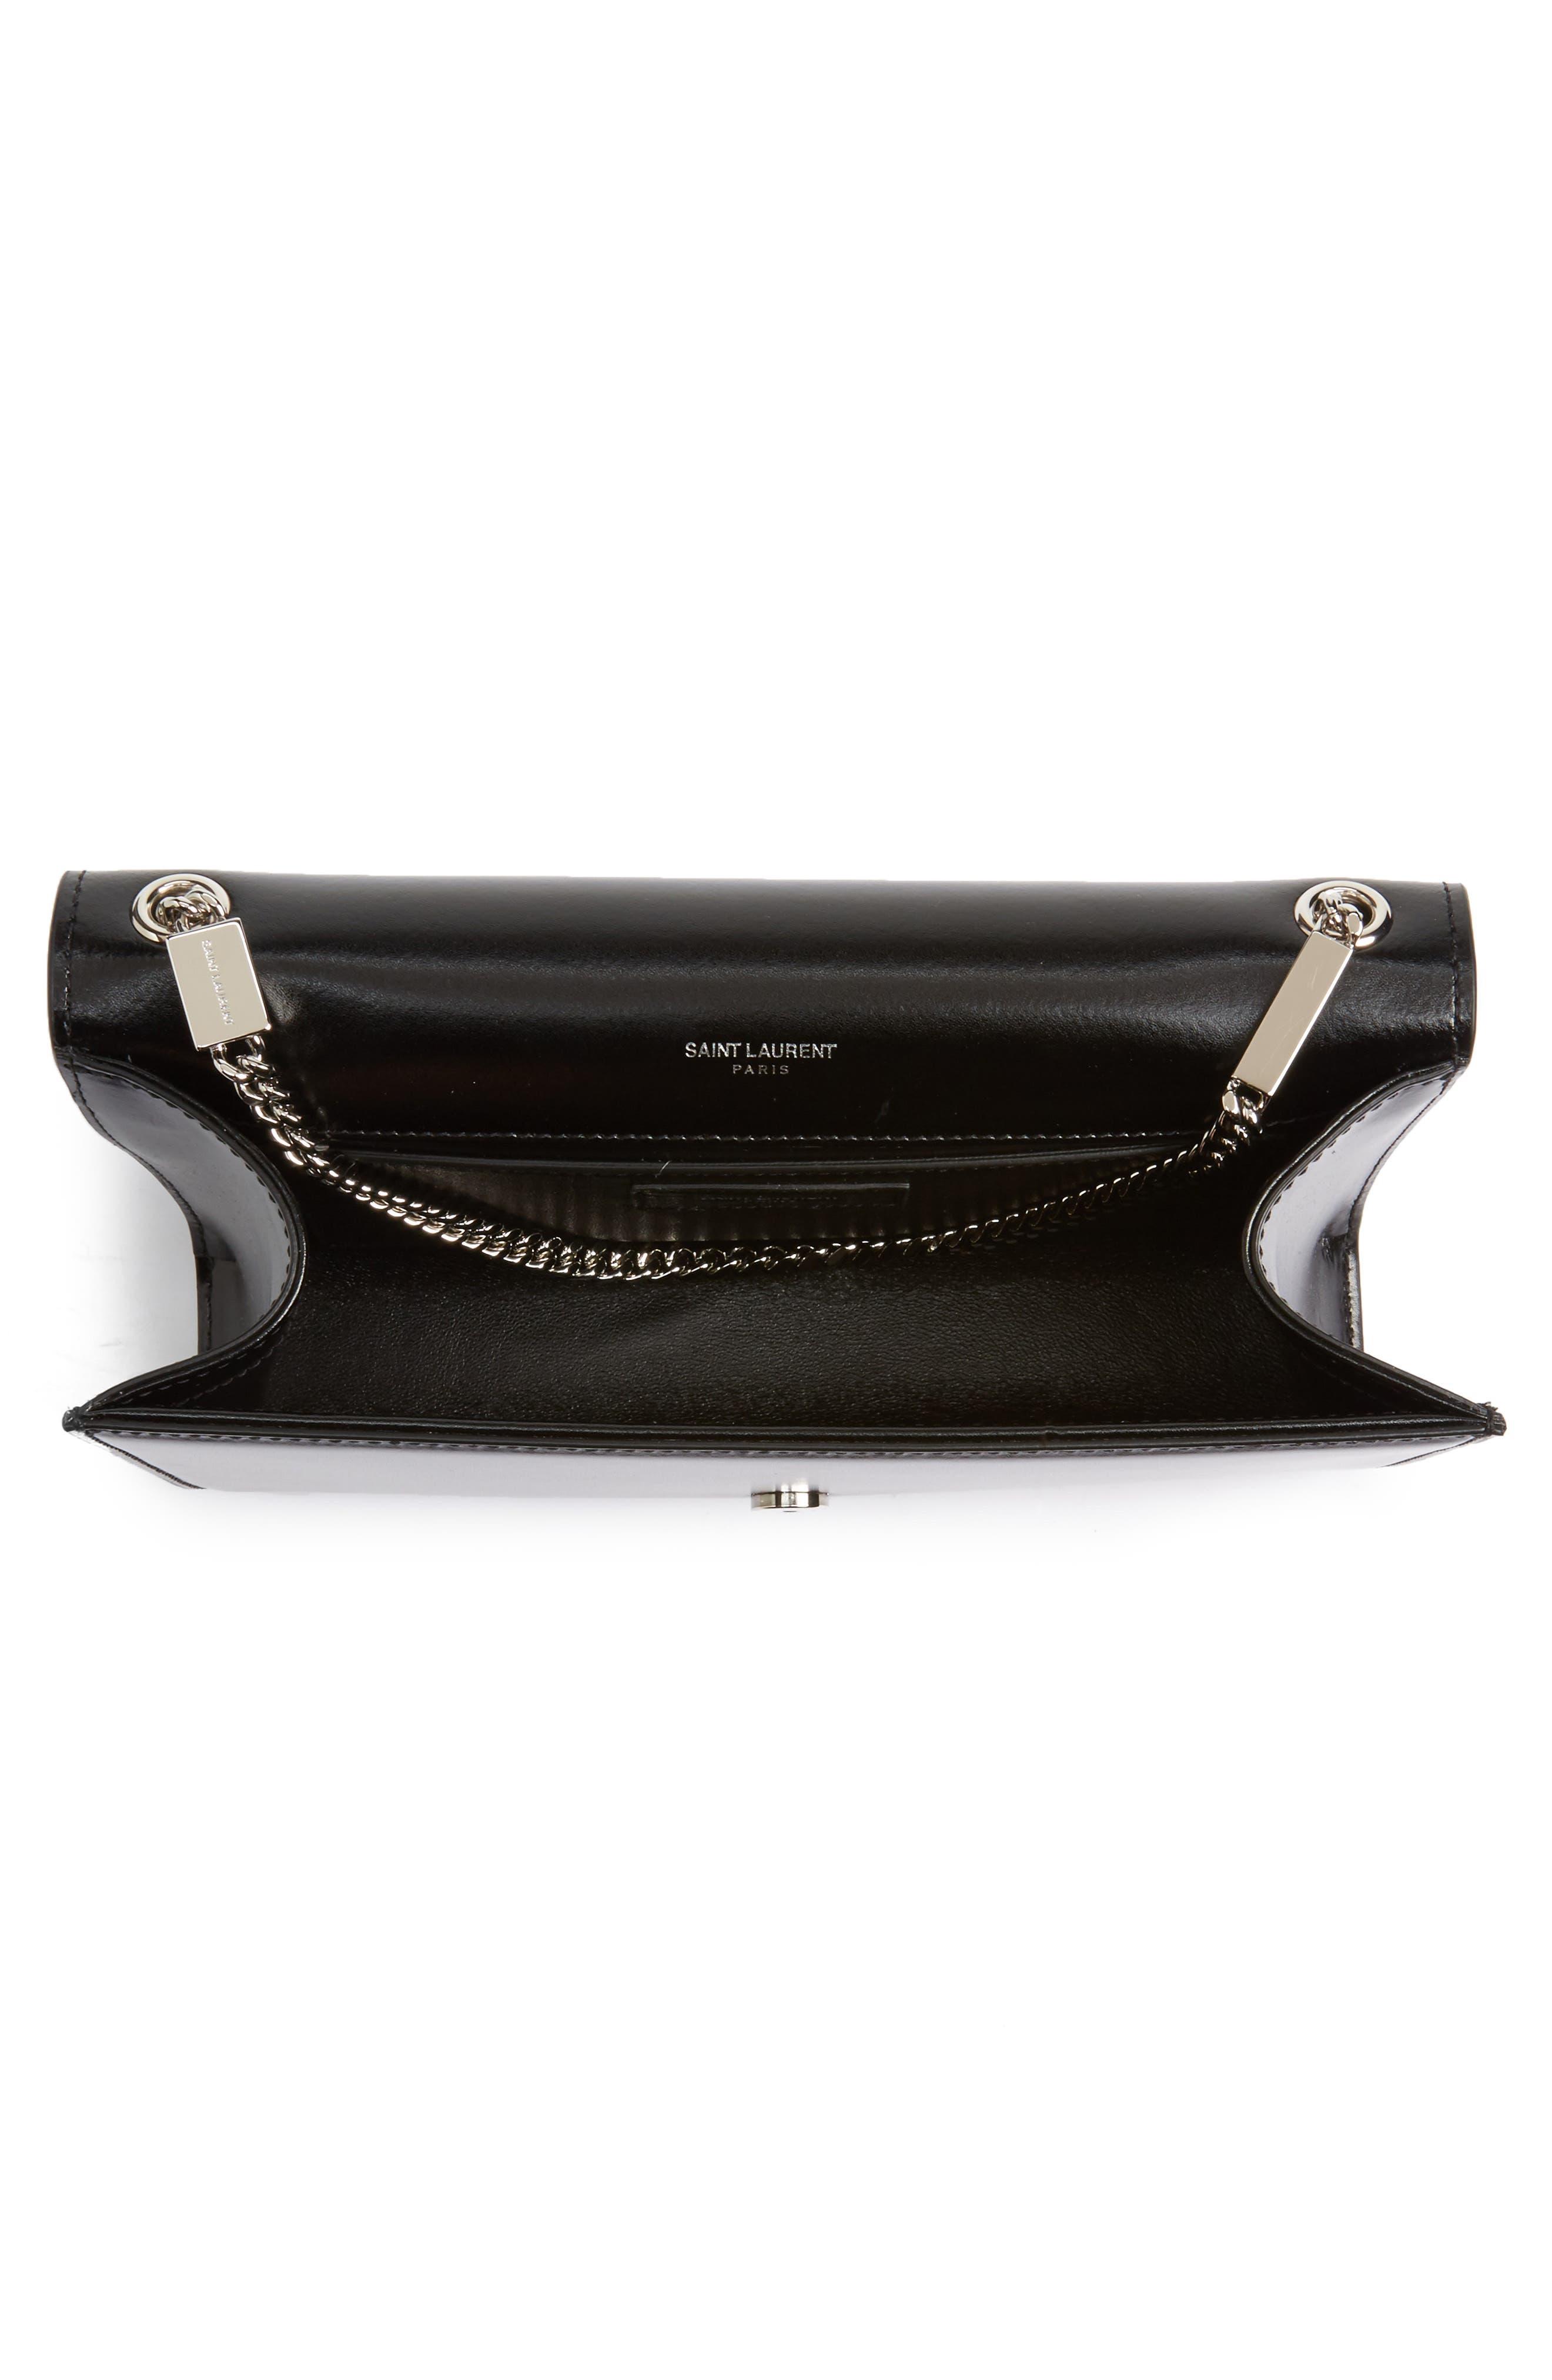 Medium Kate Calfskin Leather Crossbody Bag,                             Alternate thumbnail 4, color,                             Noir